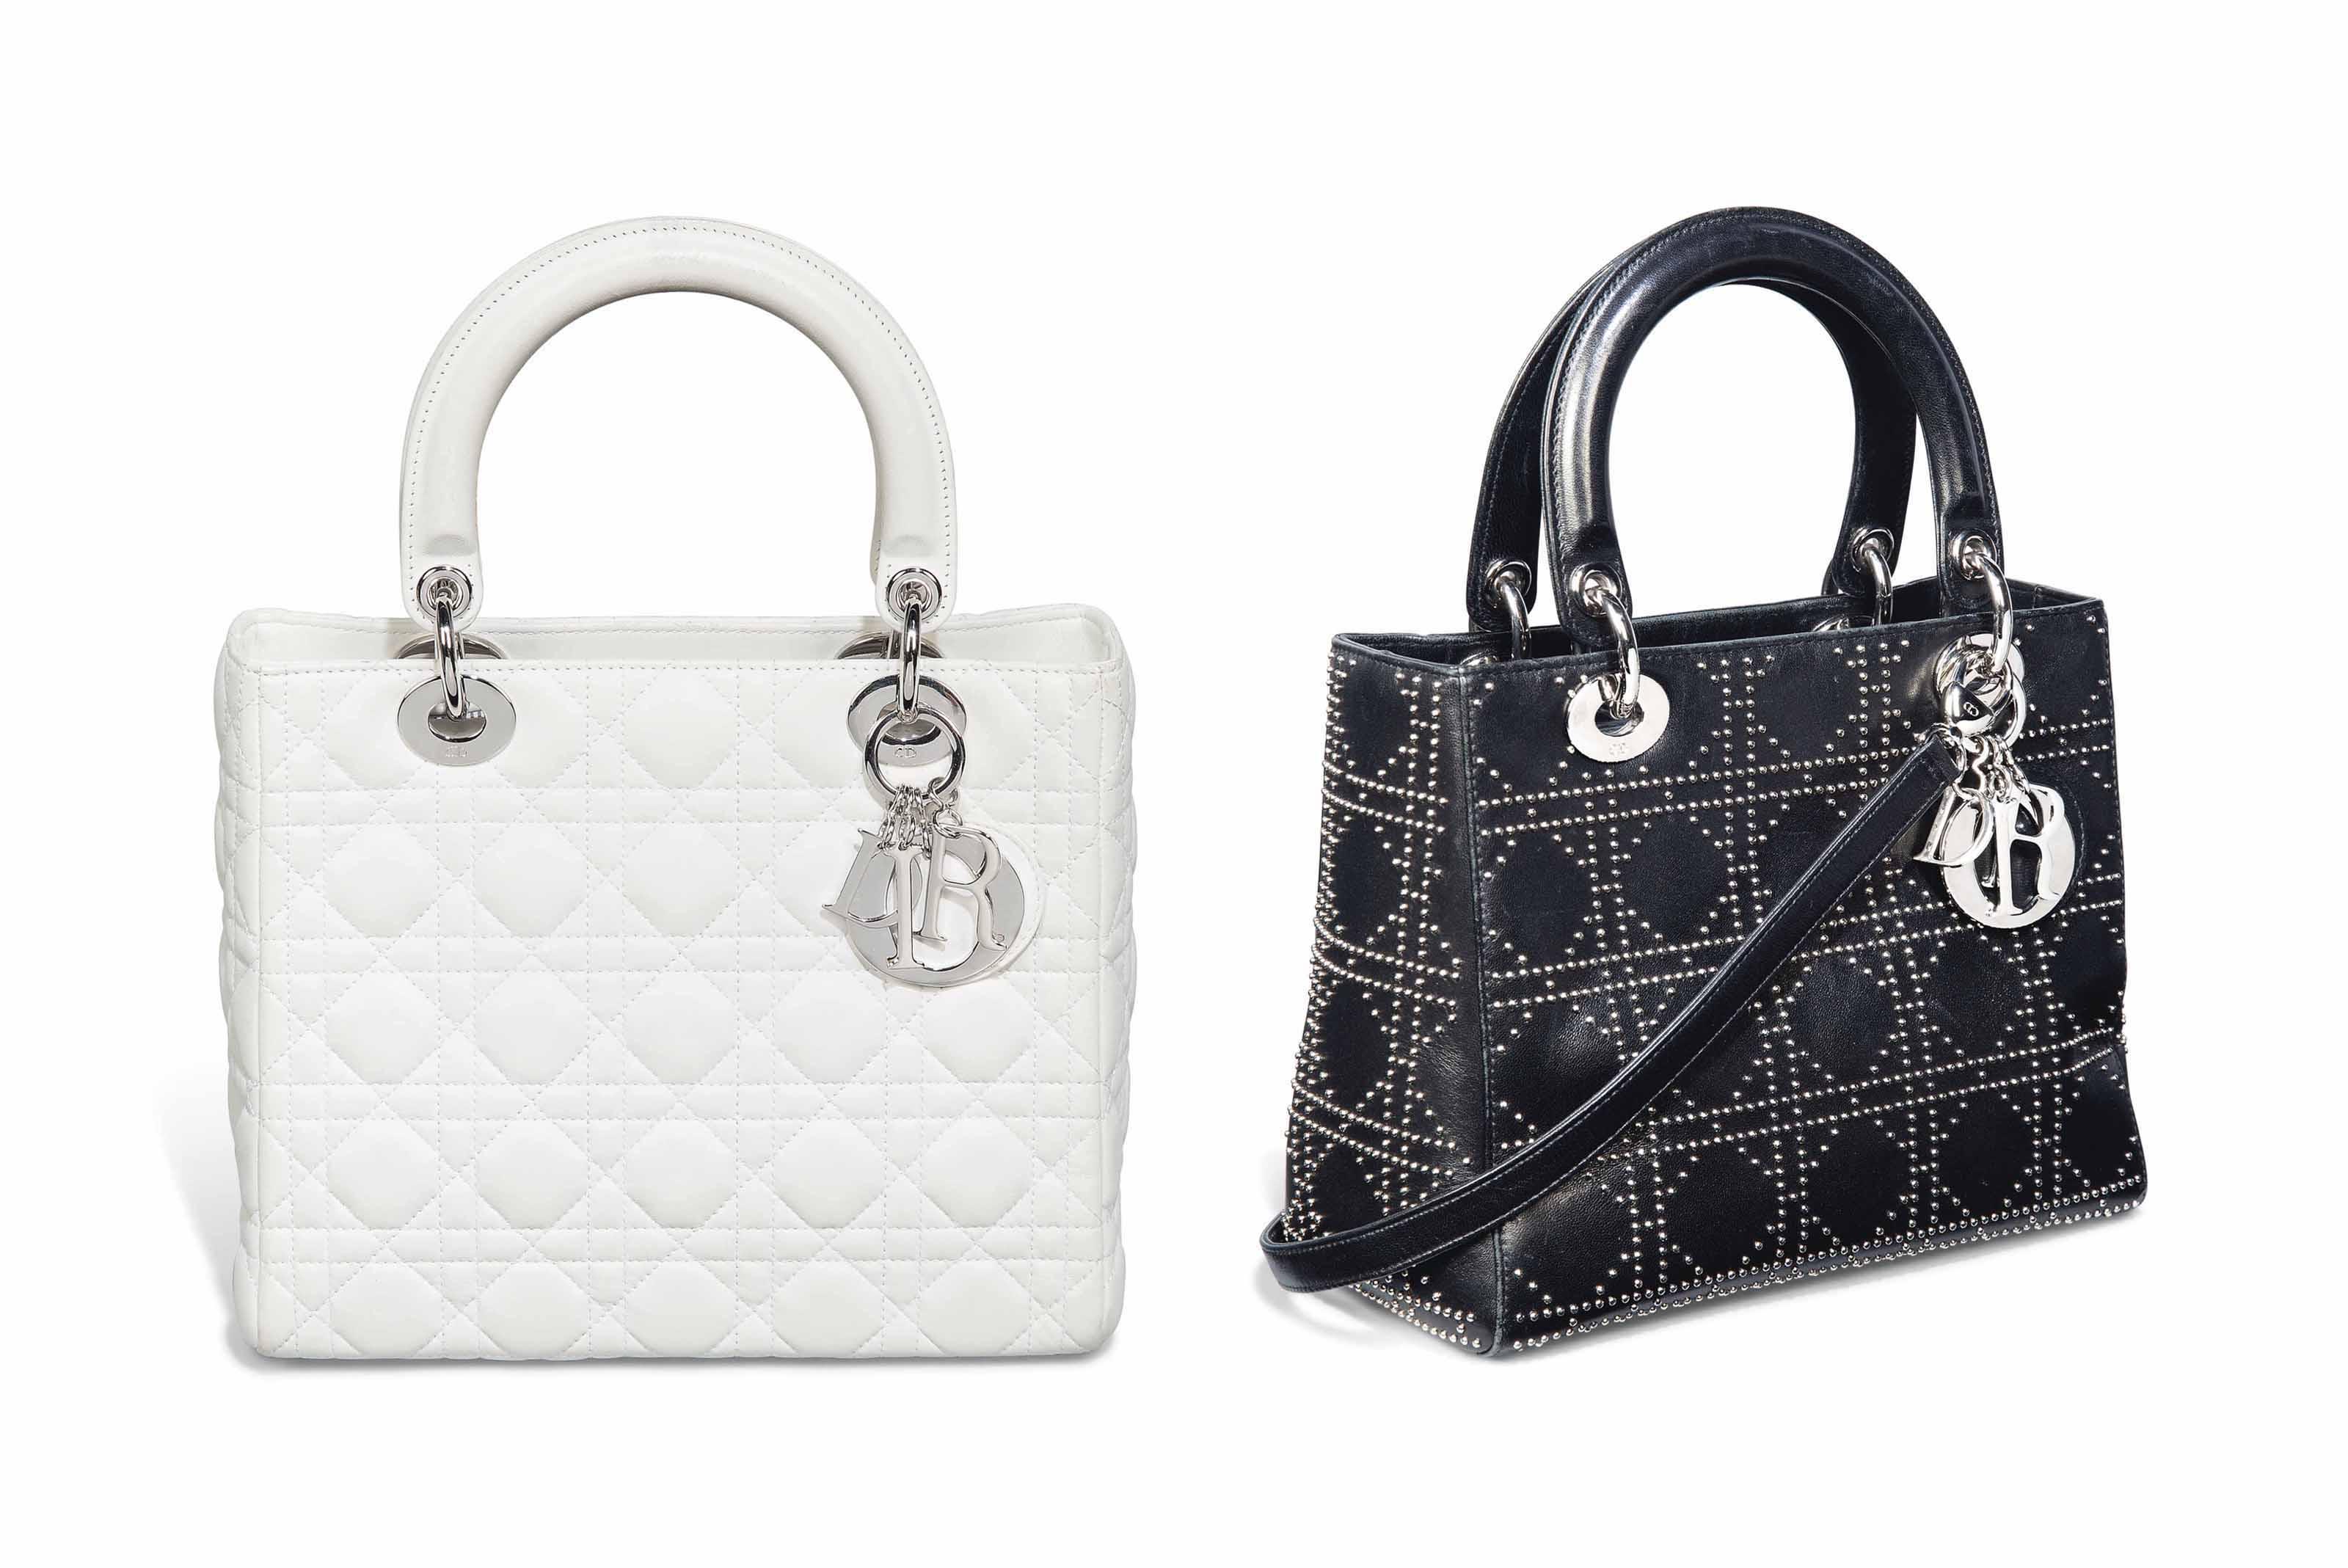 Two Lady Dior Handbags